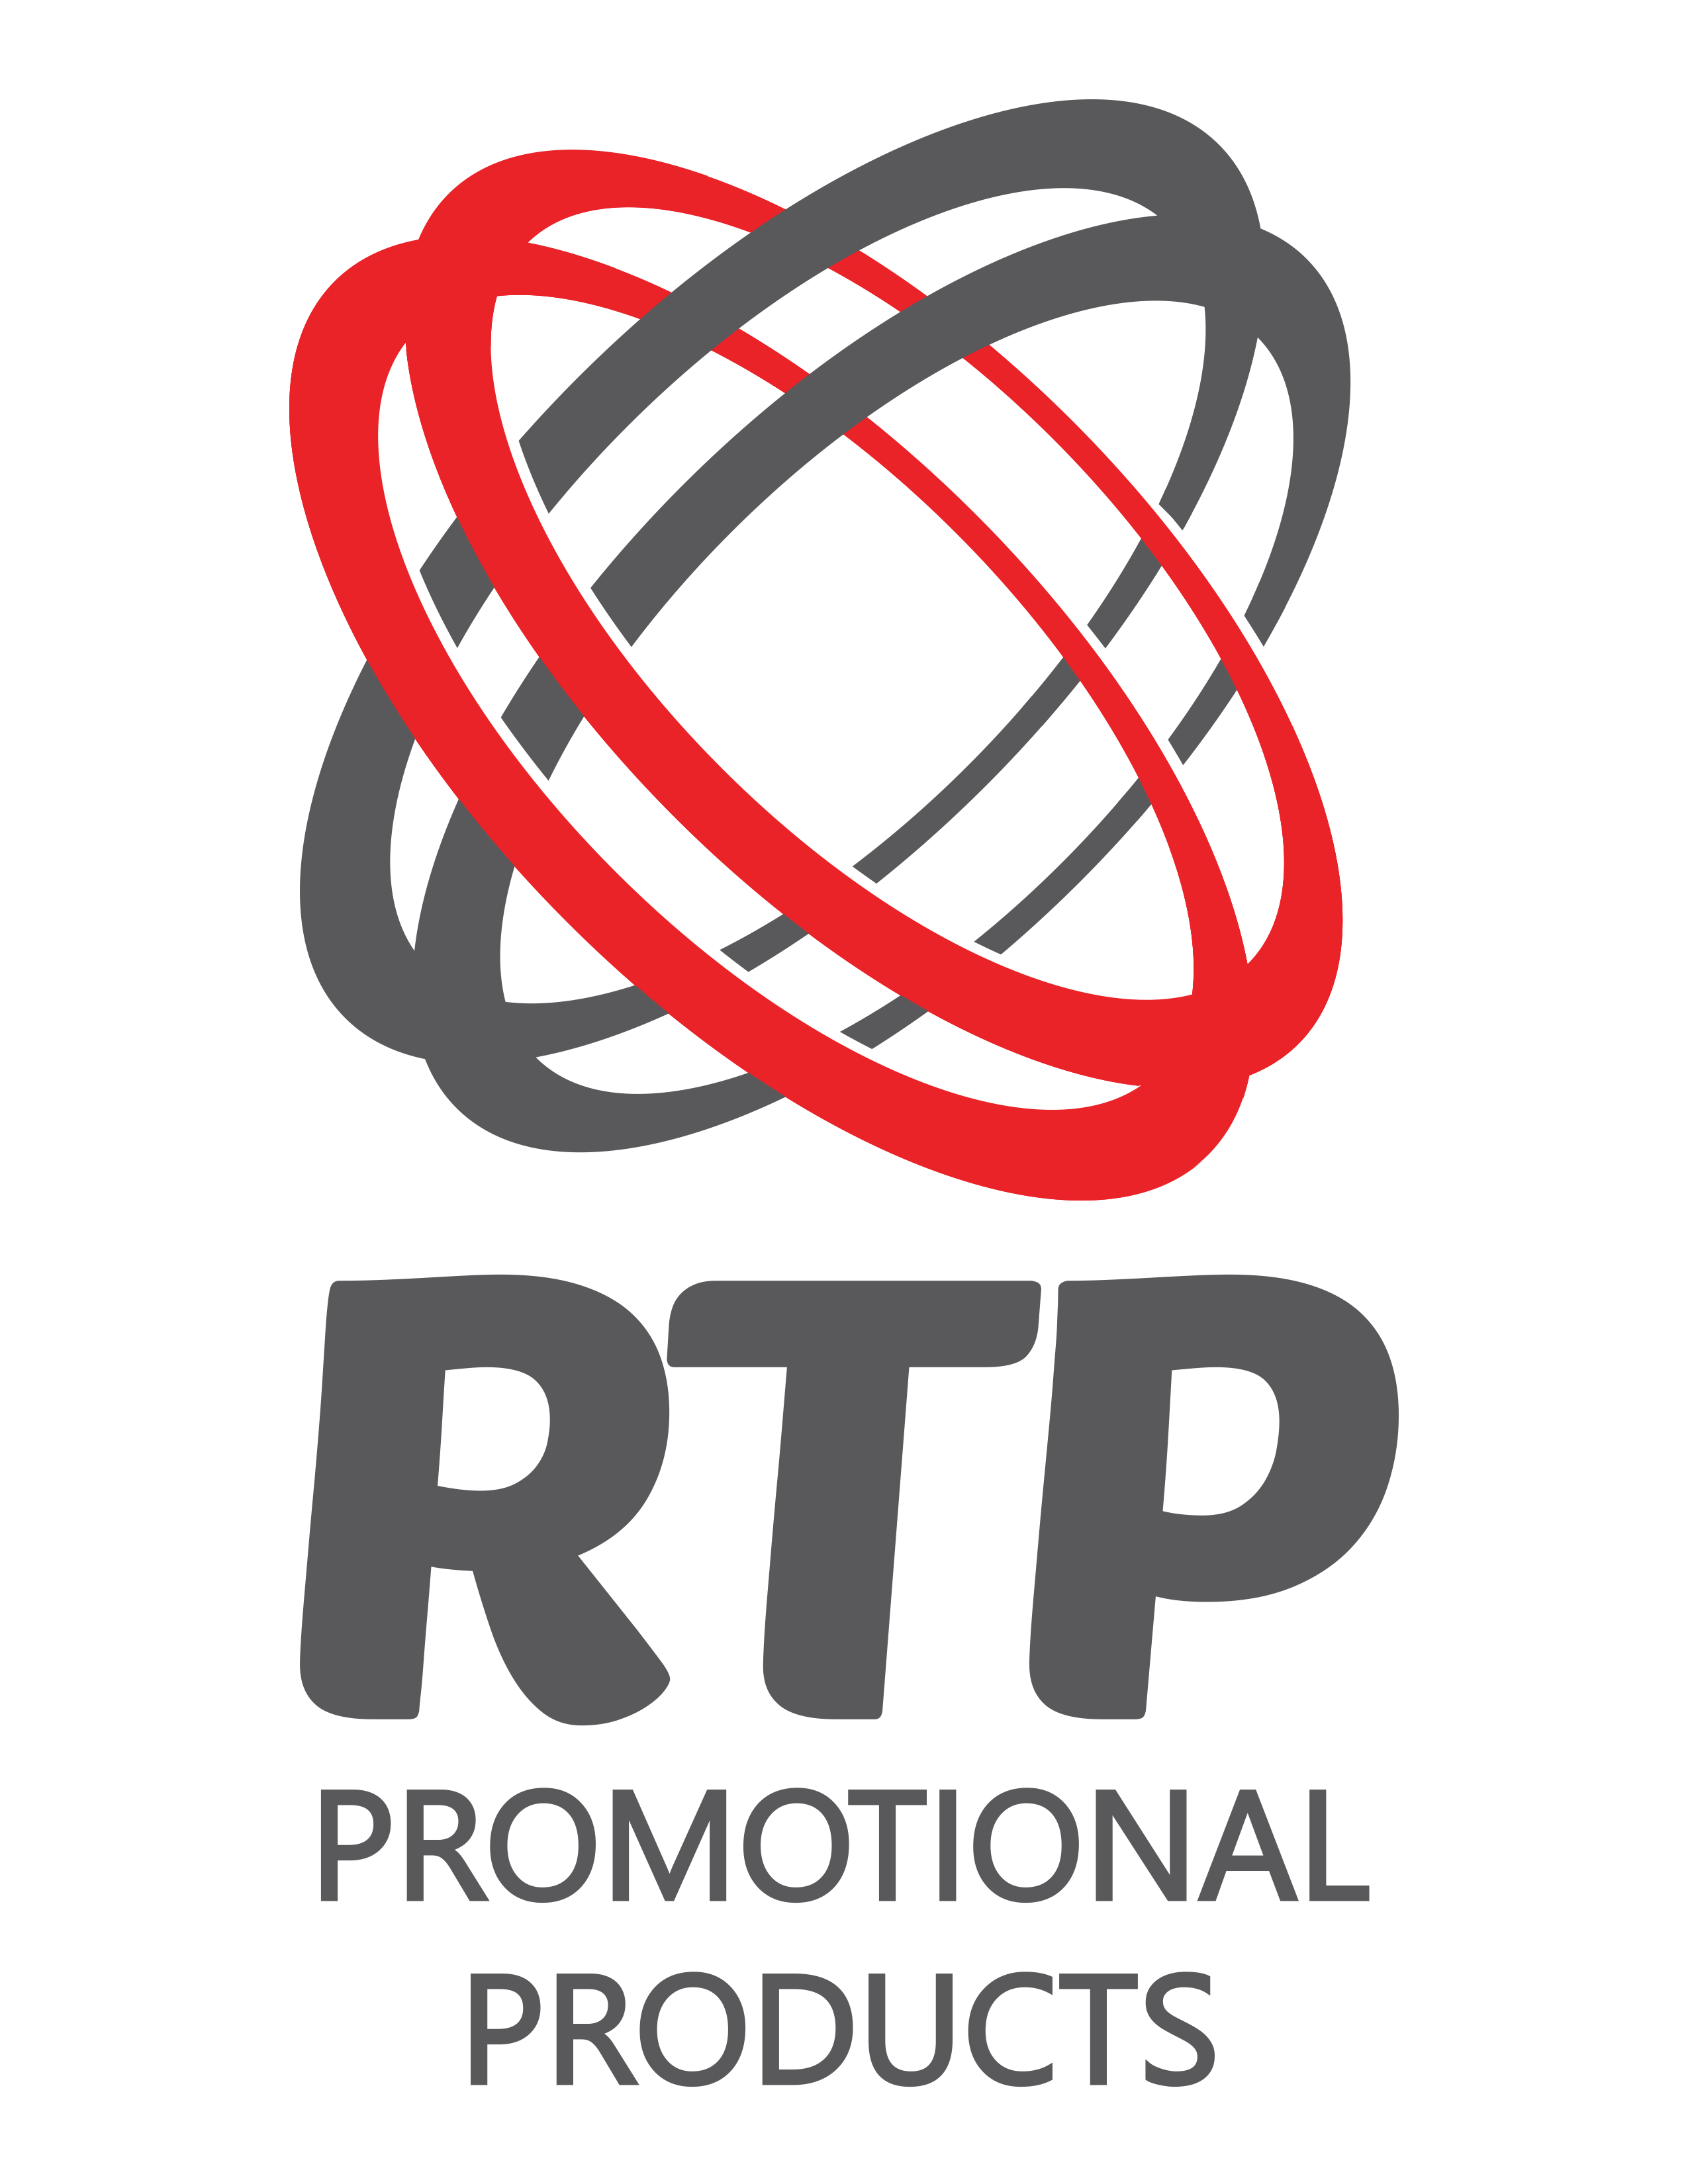 RT3P_PrimaryMark_001_Vertical